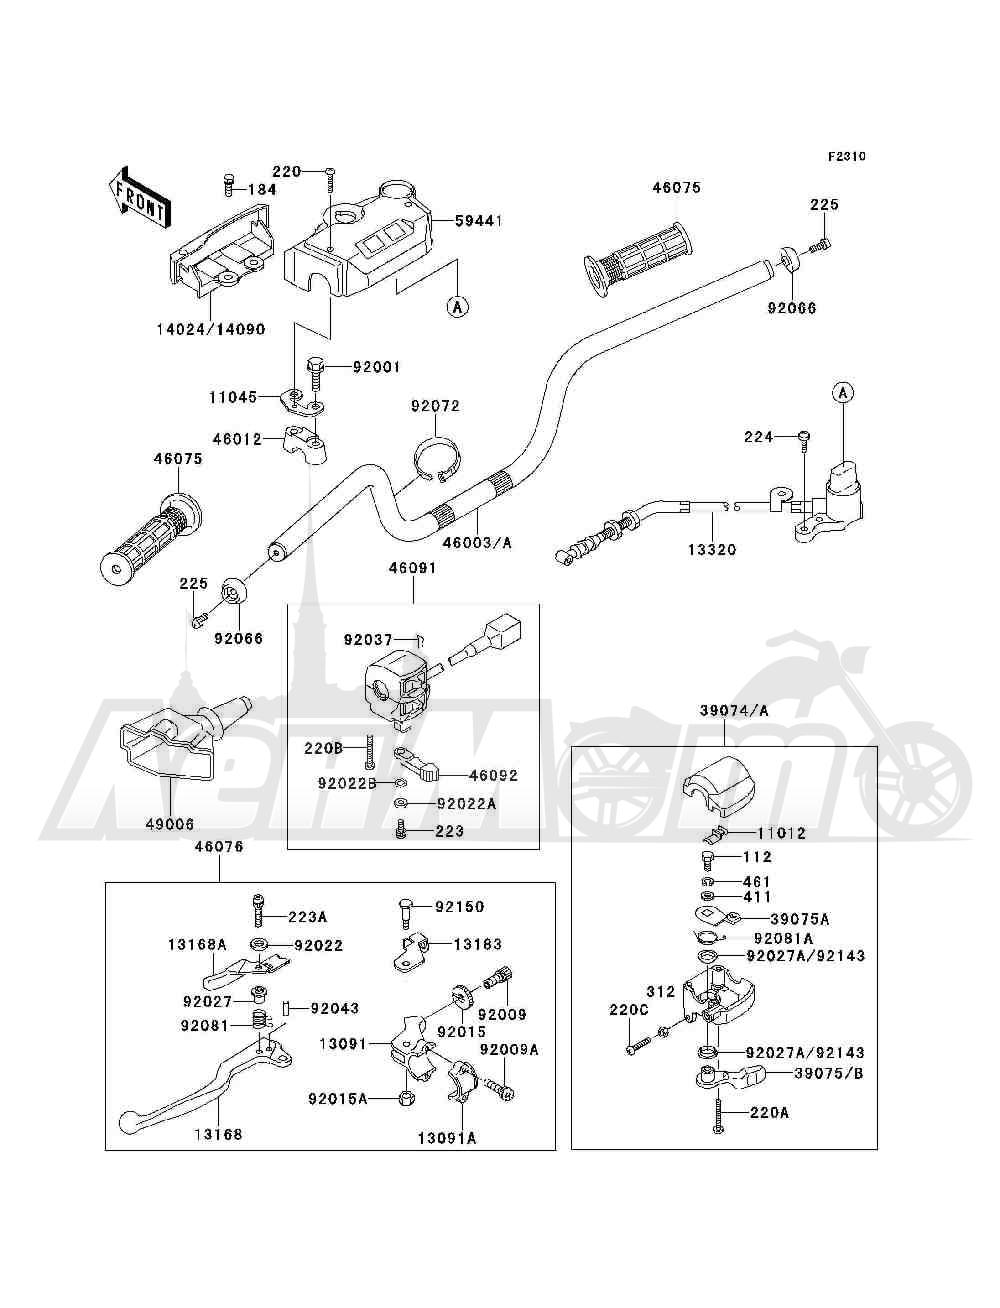 Запчасти для Квадроцикла Kawasaki 1994 BAYOU 300 4X4 (KLF300-C6) Раздел: HANDLEBAR   руль